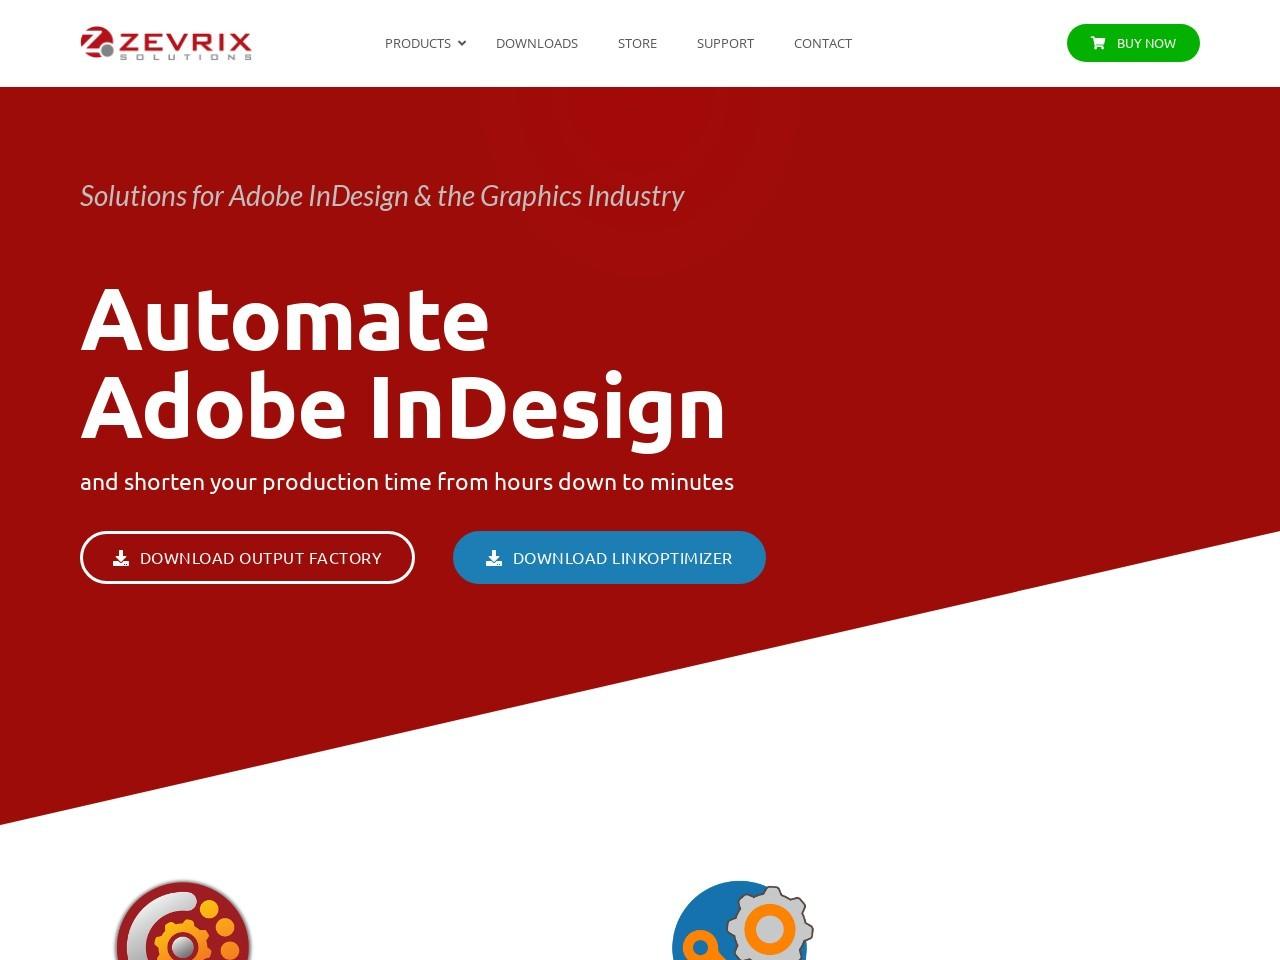 Zevrix Solutions